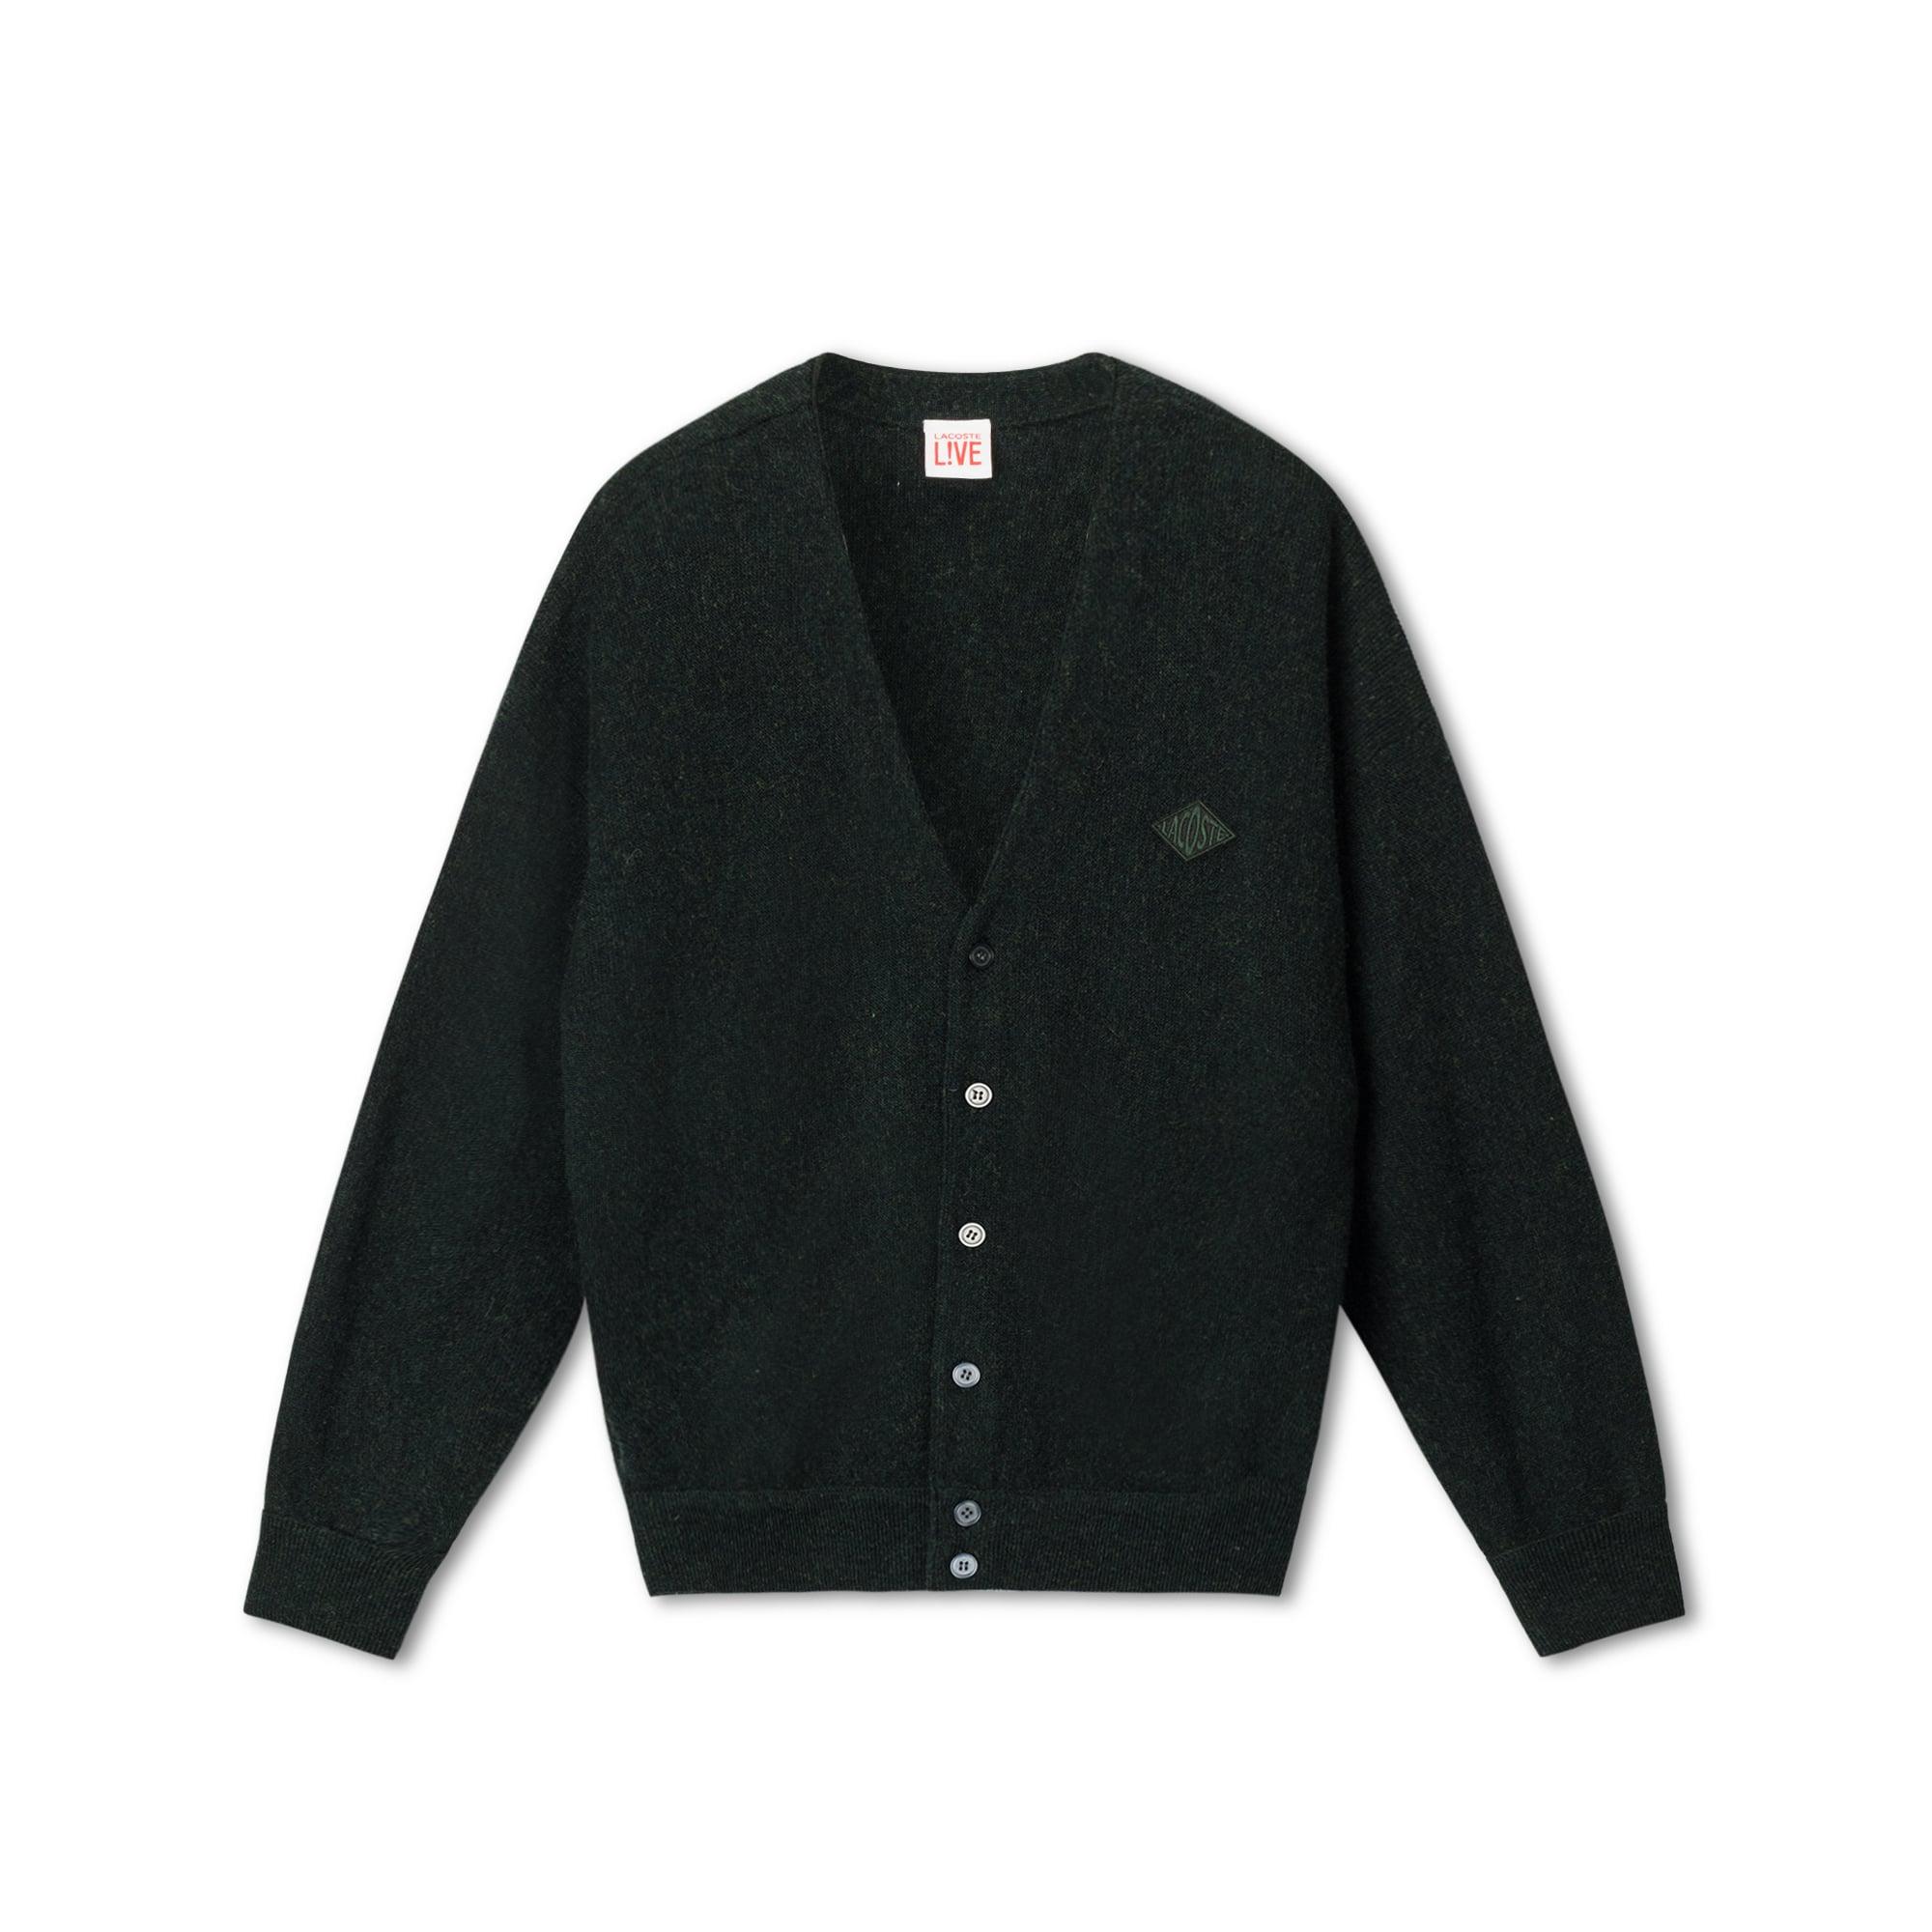 Lacoste Live系列羊毛针织男士徽章开襟羊毛衫